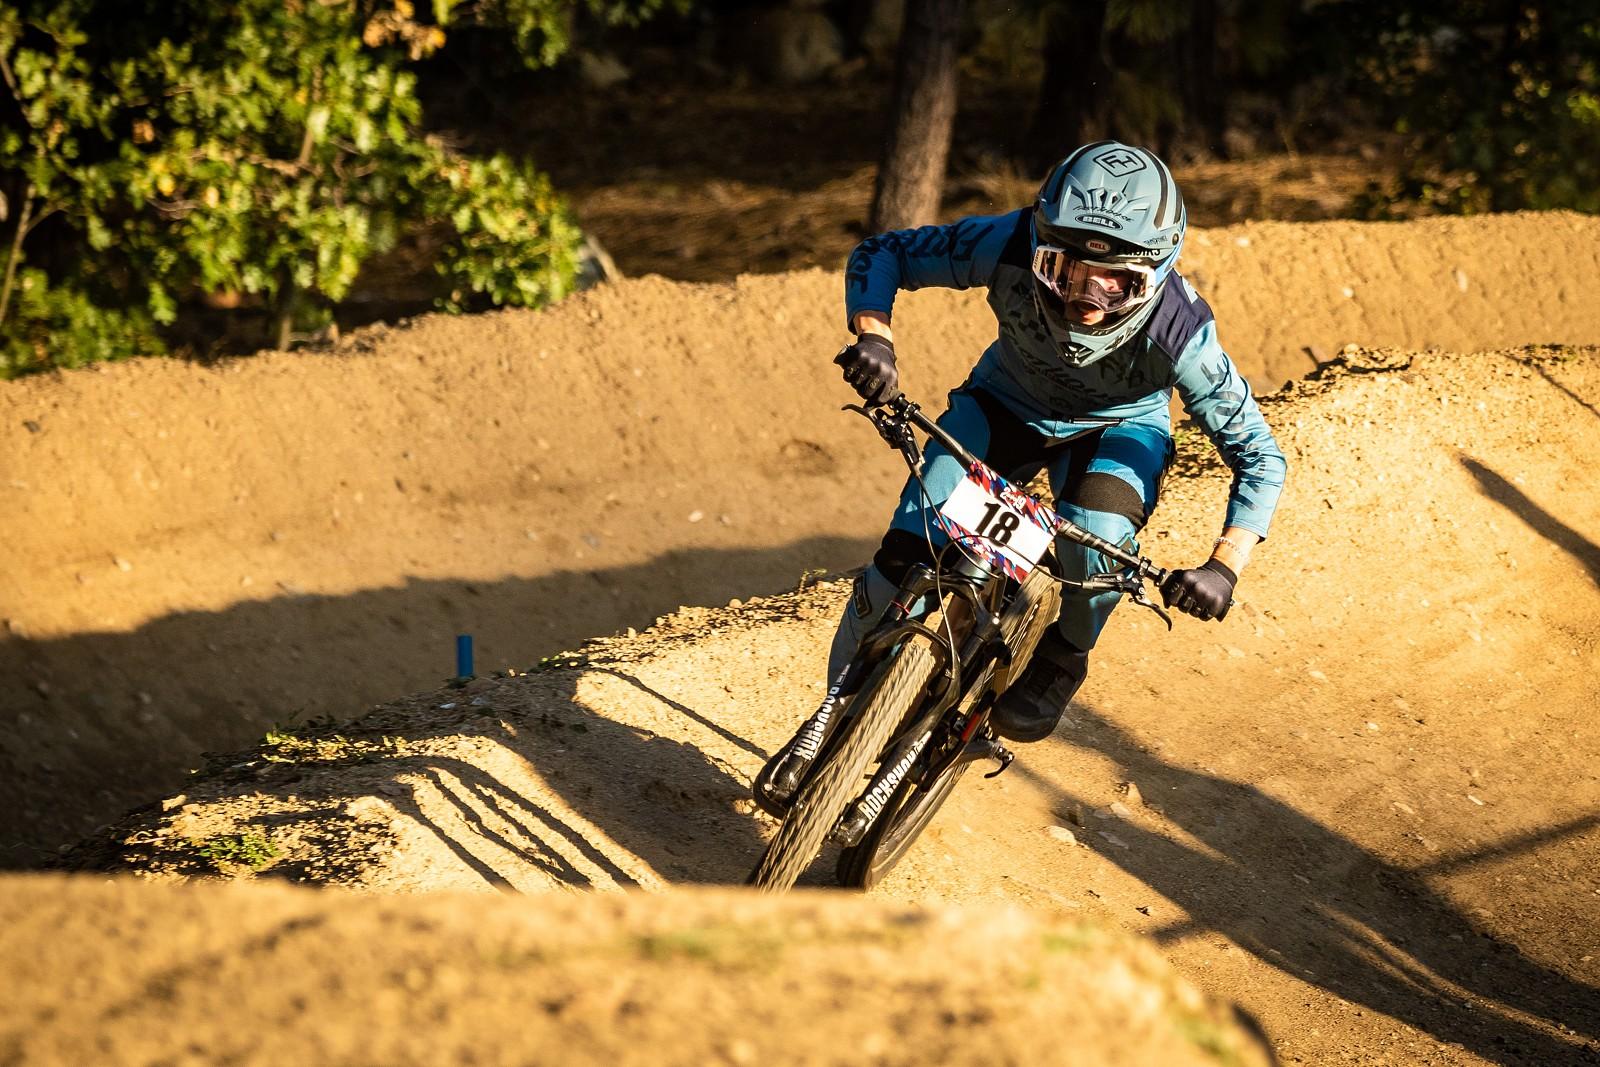 2019UsOpenSlalom-32 - ALeedomPhotography - Mountain Biking Pictures - Vital MTB